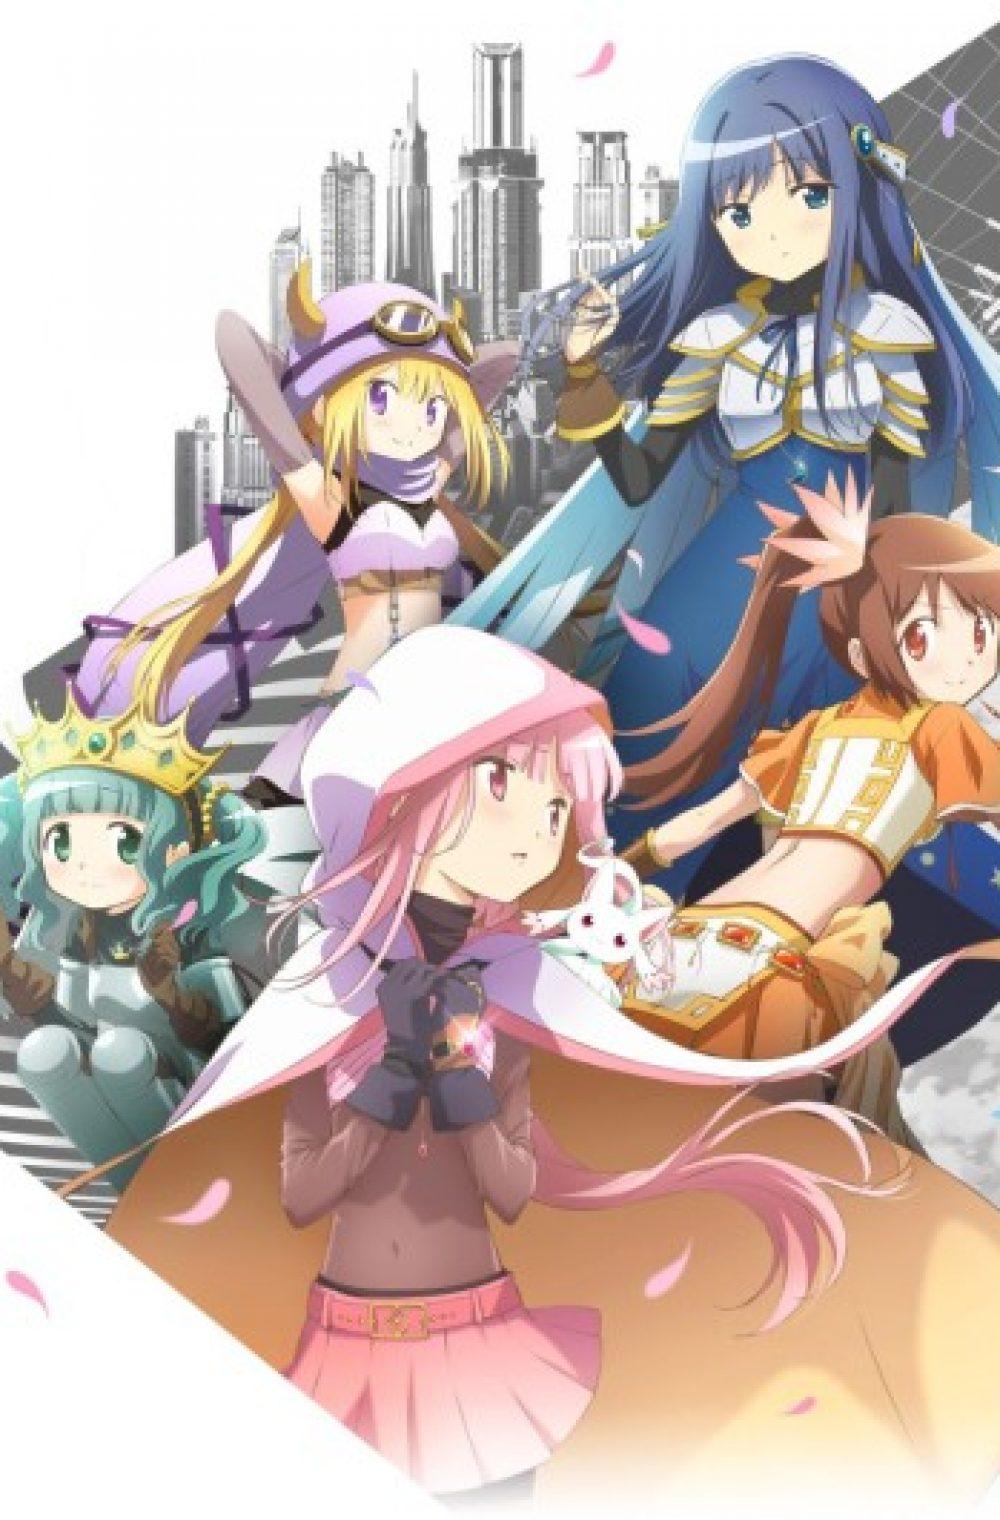 Magia Record: Mahou Shoujo Madoka☆Magica Gaiden ( Puella Magi Madoka Magica Side Story: Magia Record )